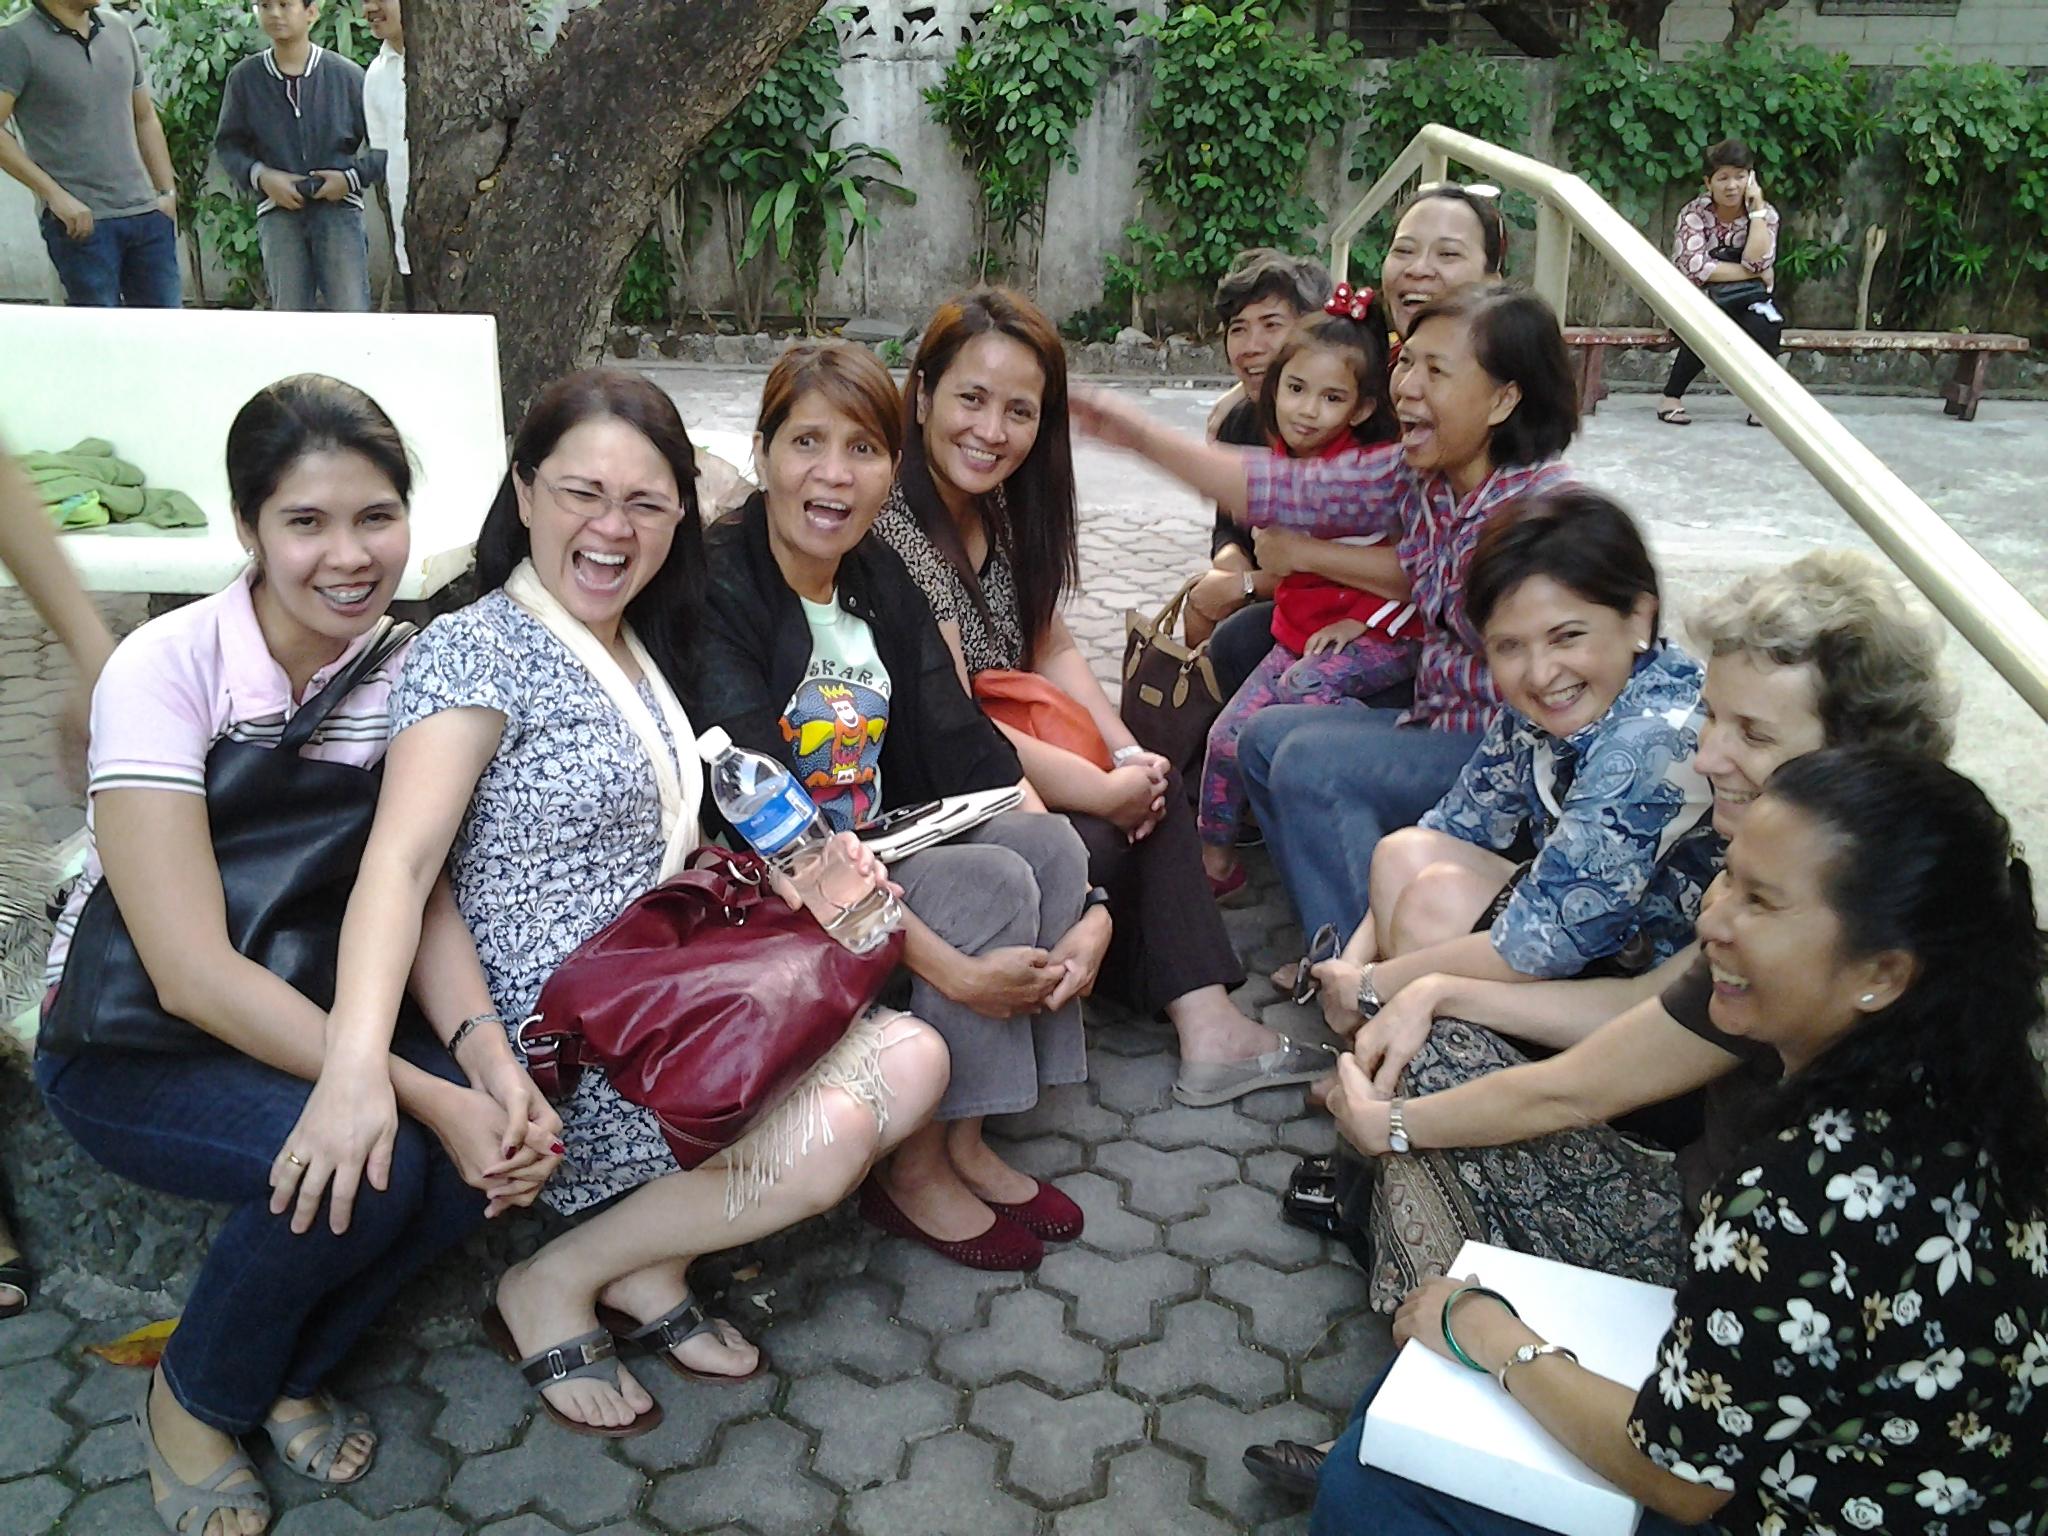 ladies having fun